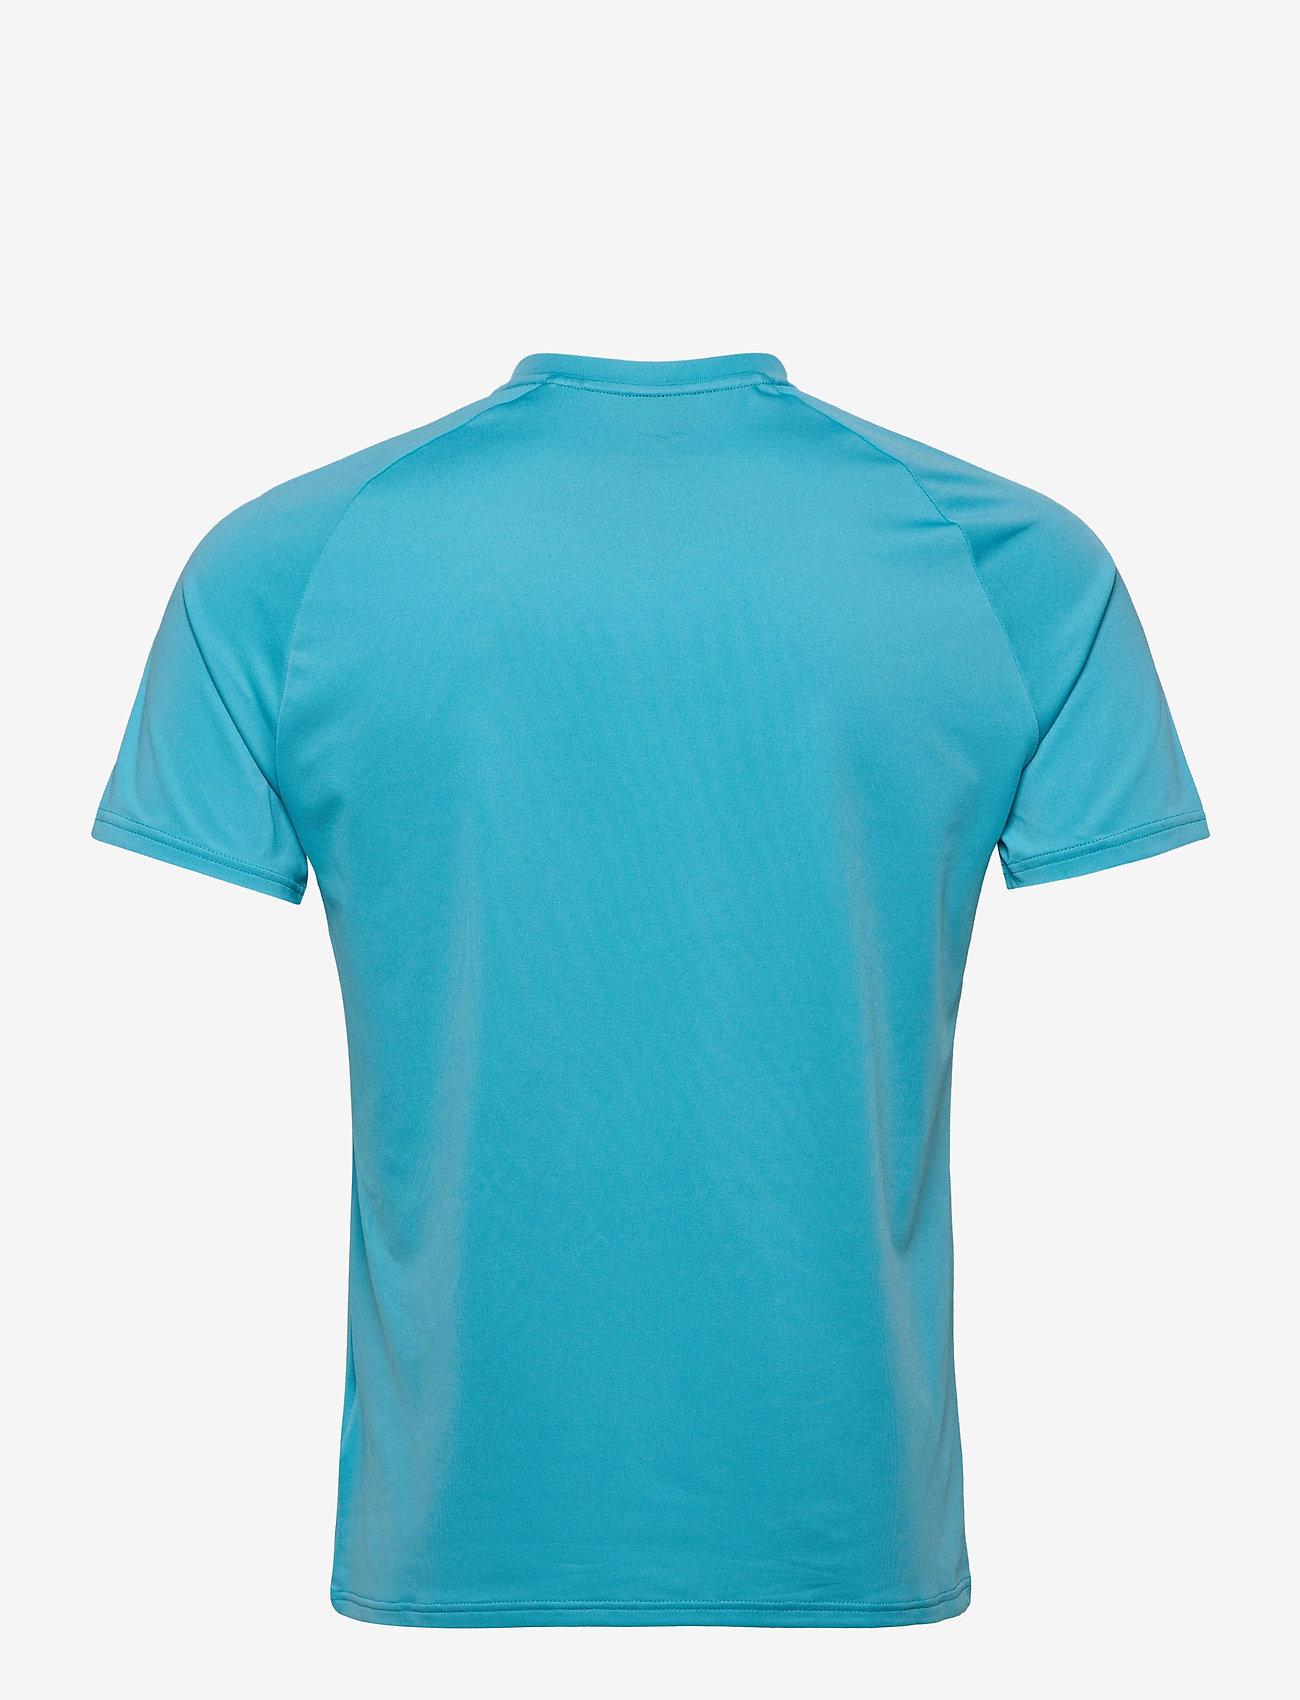 Mizuno Shadow Polo - Poloskjorter SCUBA BLUE - Menn Klær